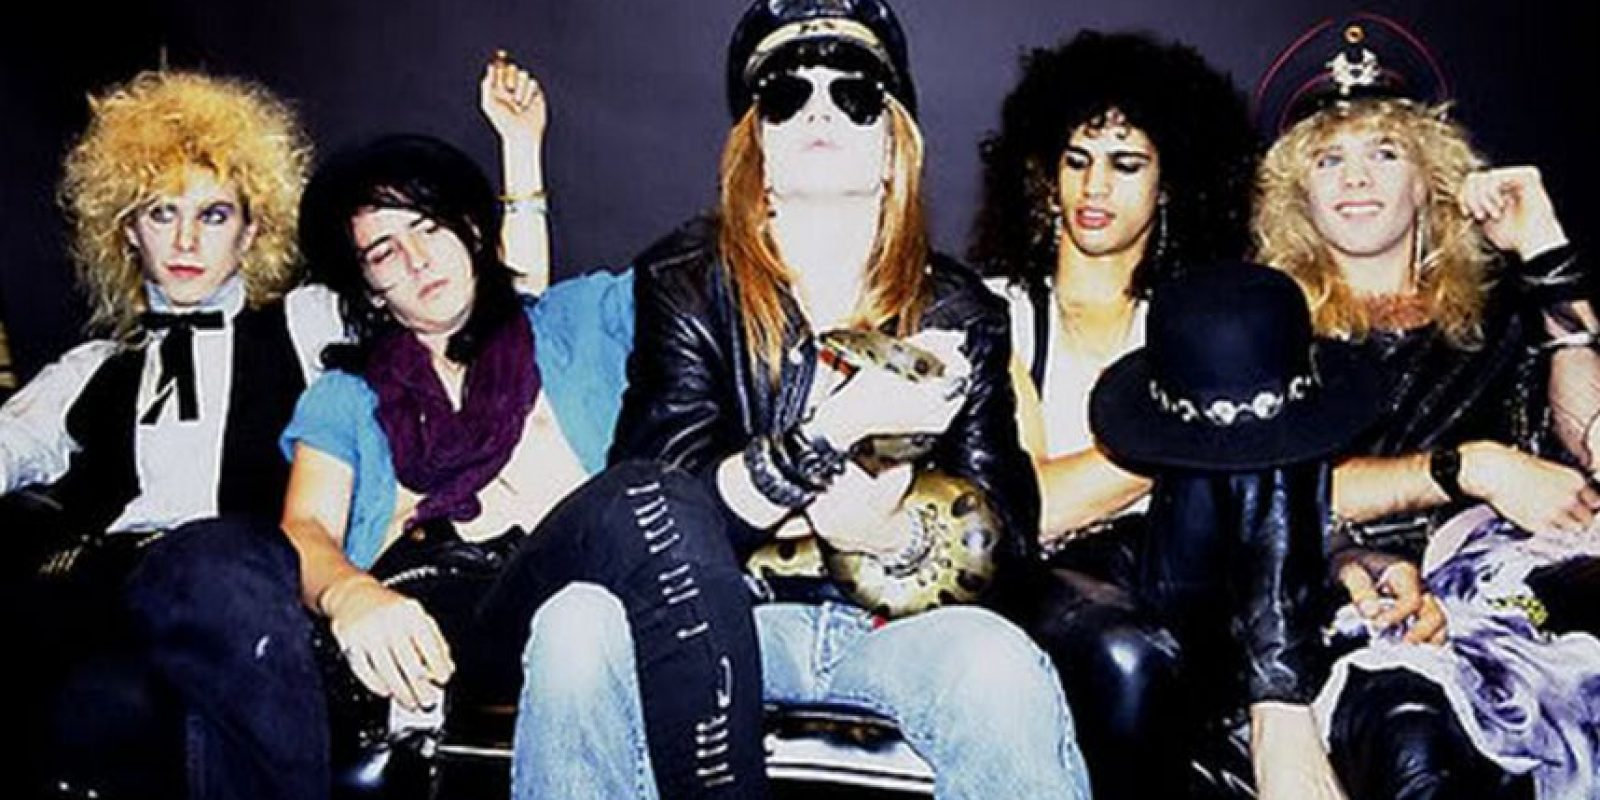 La formación de la banda Guns N' Roses Foto:taringa.net